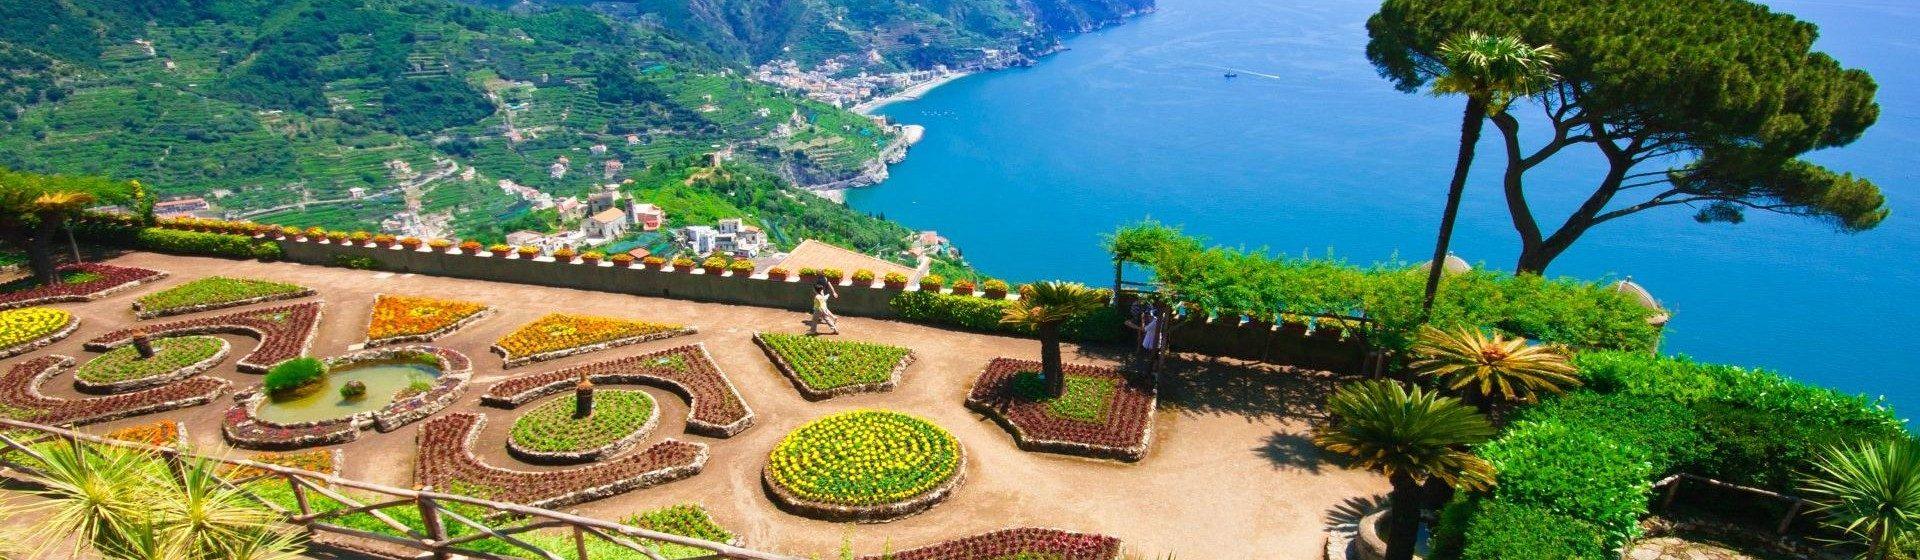 Drivinaples Ravello Amalfi Coast  Tour Shore Excurision